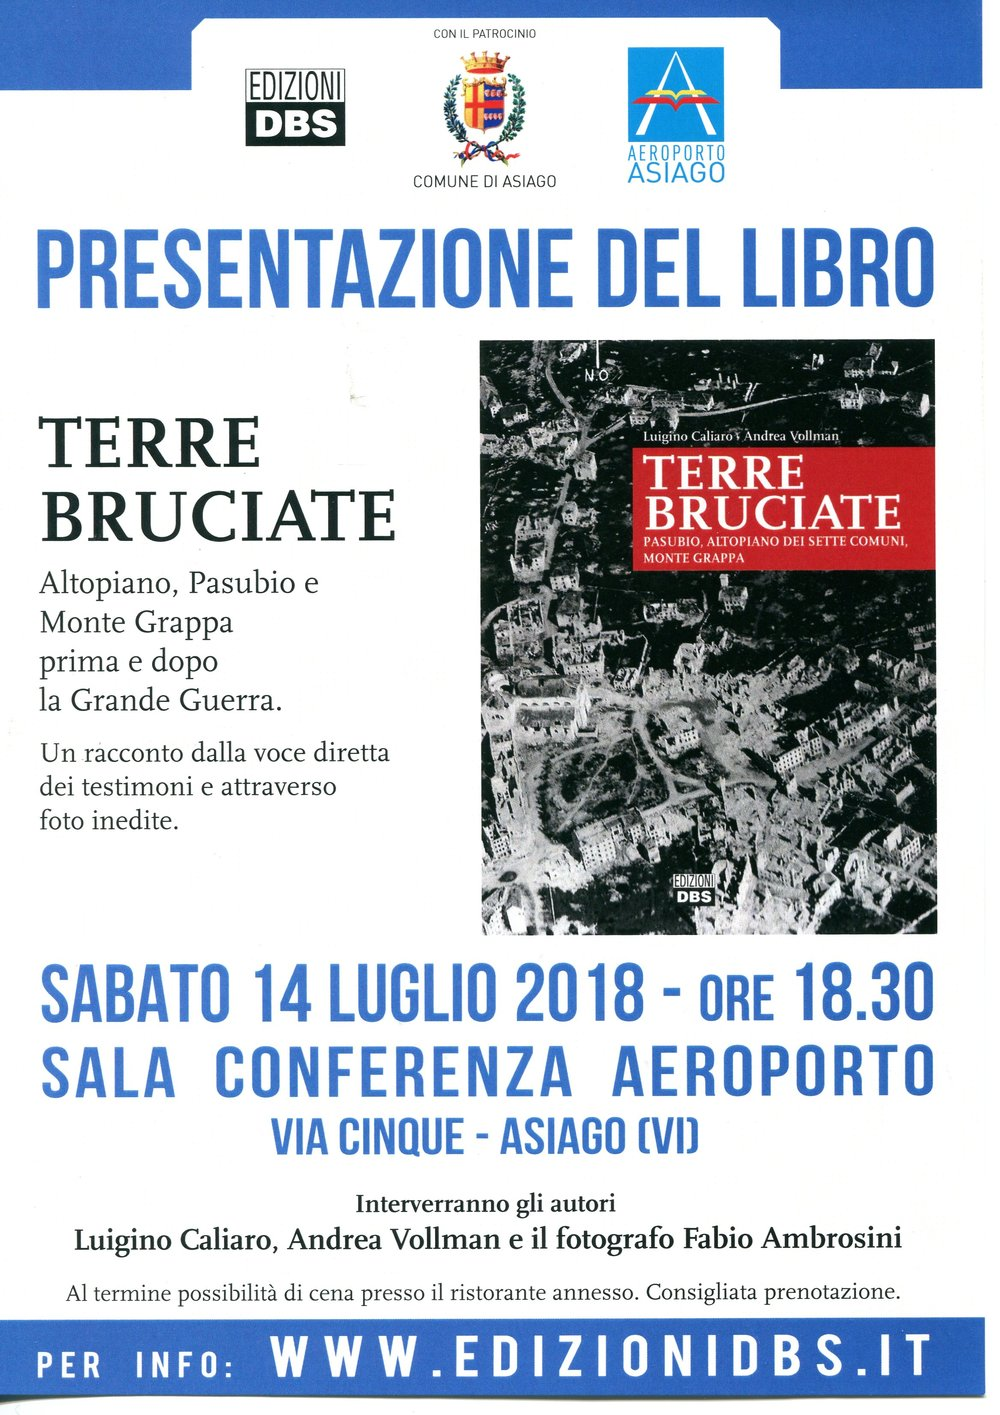 locandina caliaro biblioteca cesuna 2018.jpg